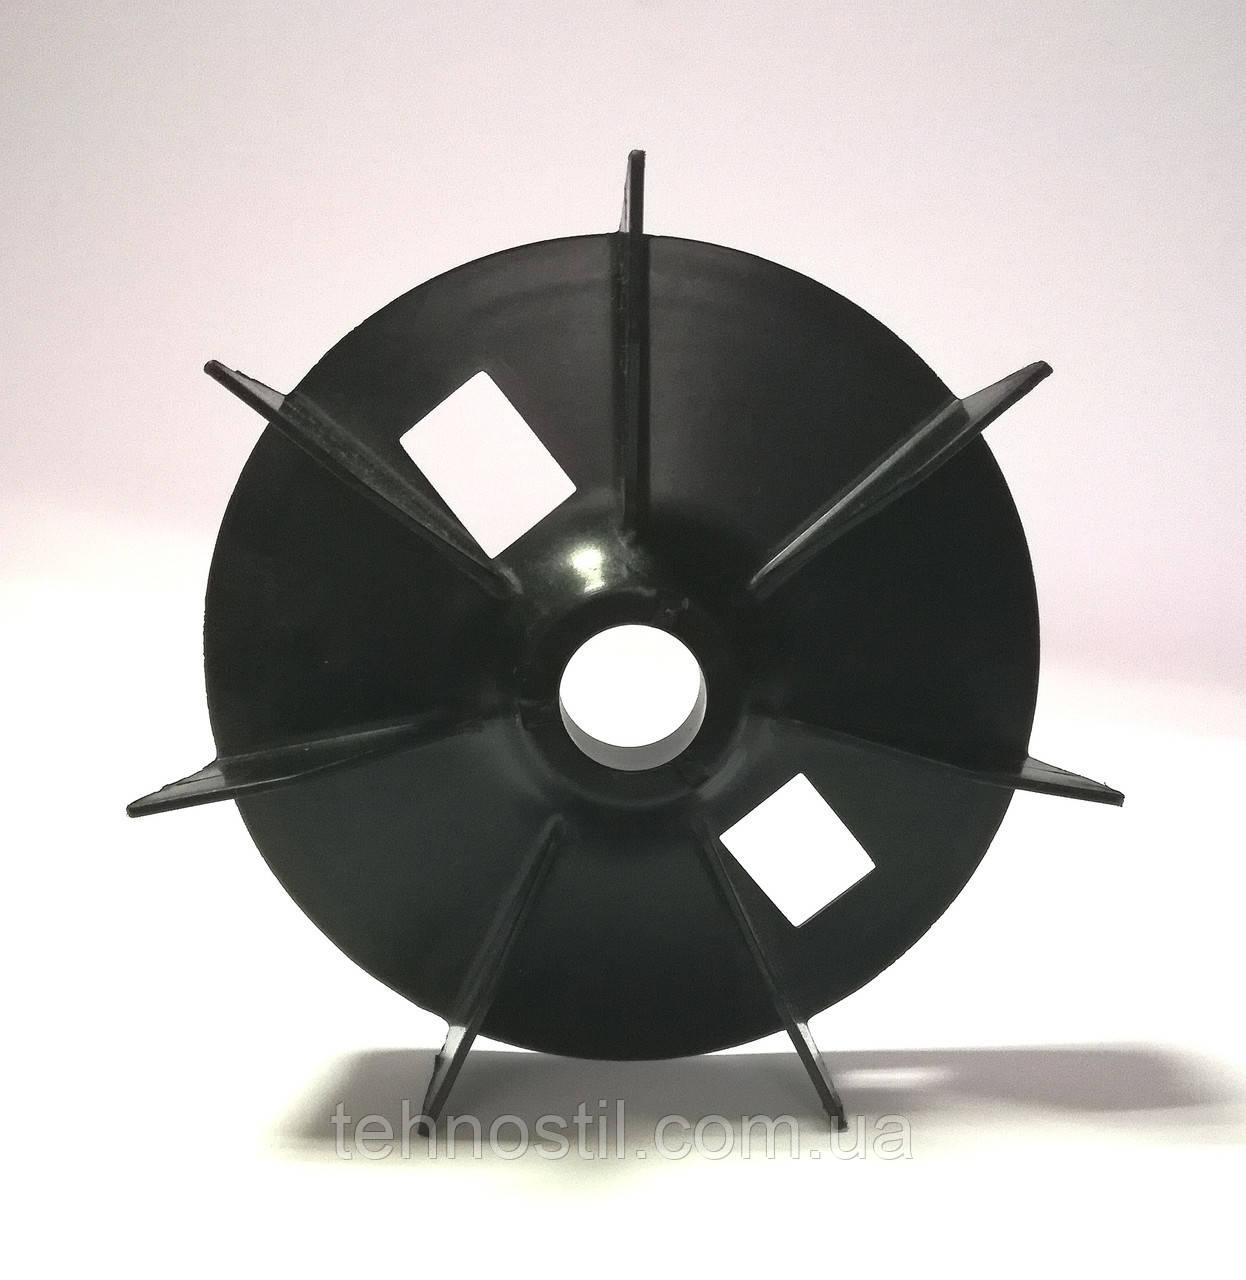 Вентилятор обдува двигателя (крыльчатка) Pedrollo FAN-80